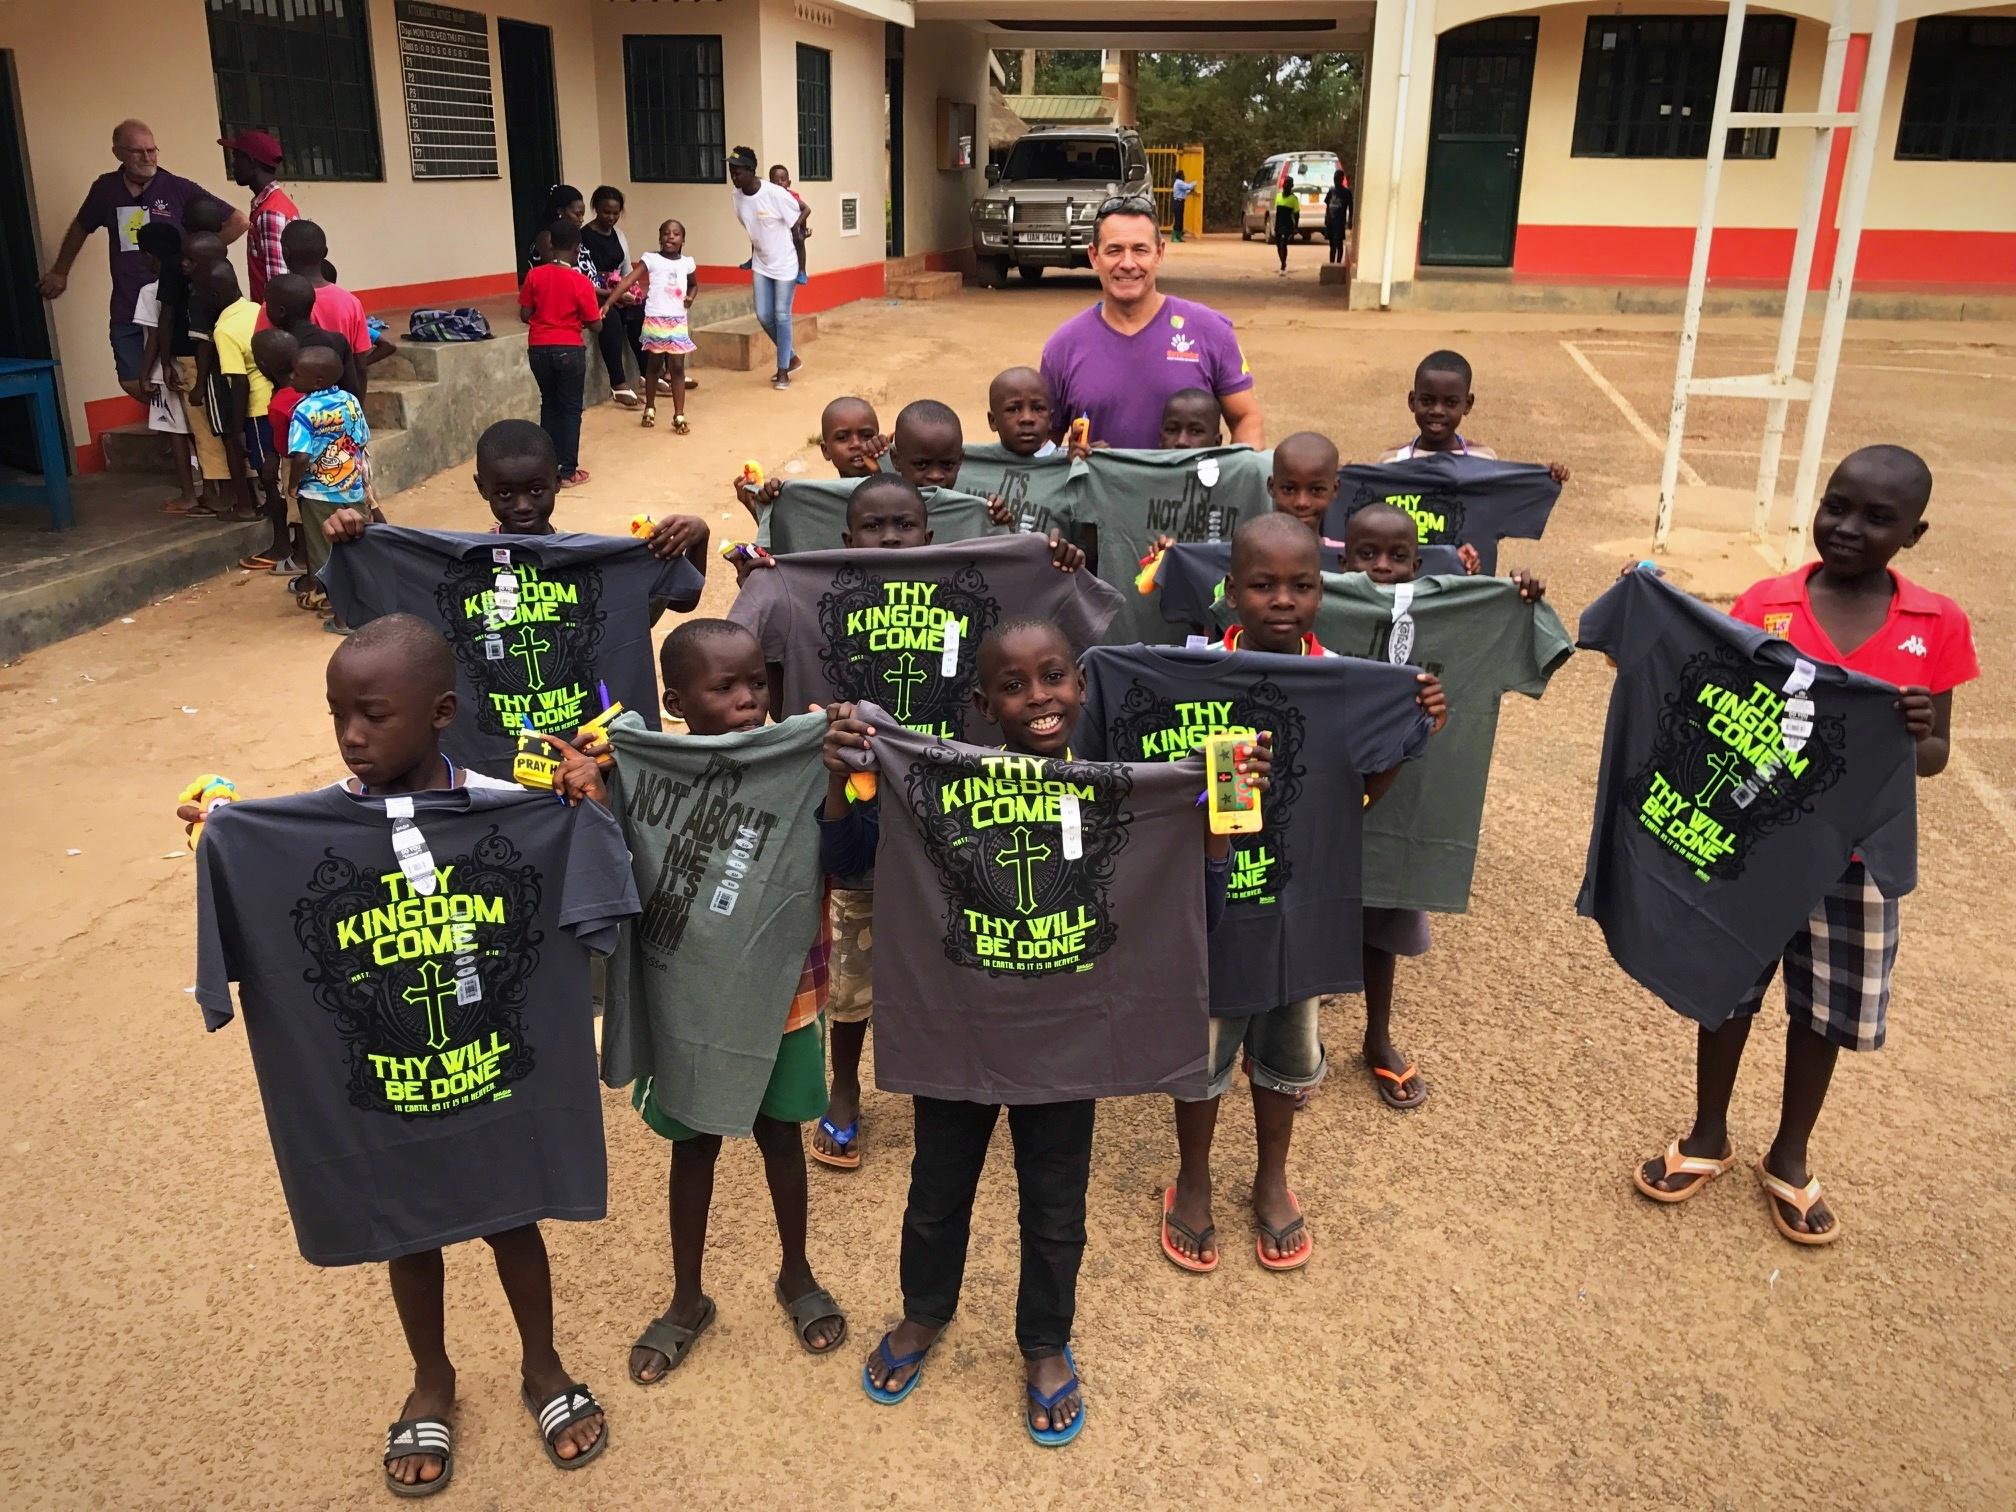 uganda kids kerusso shirts-672781-edited.jpg